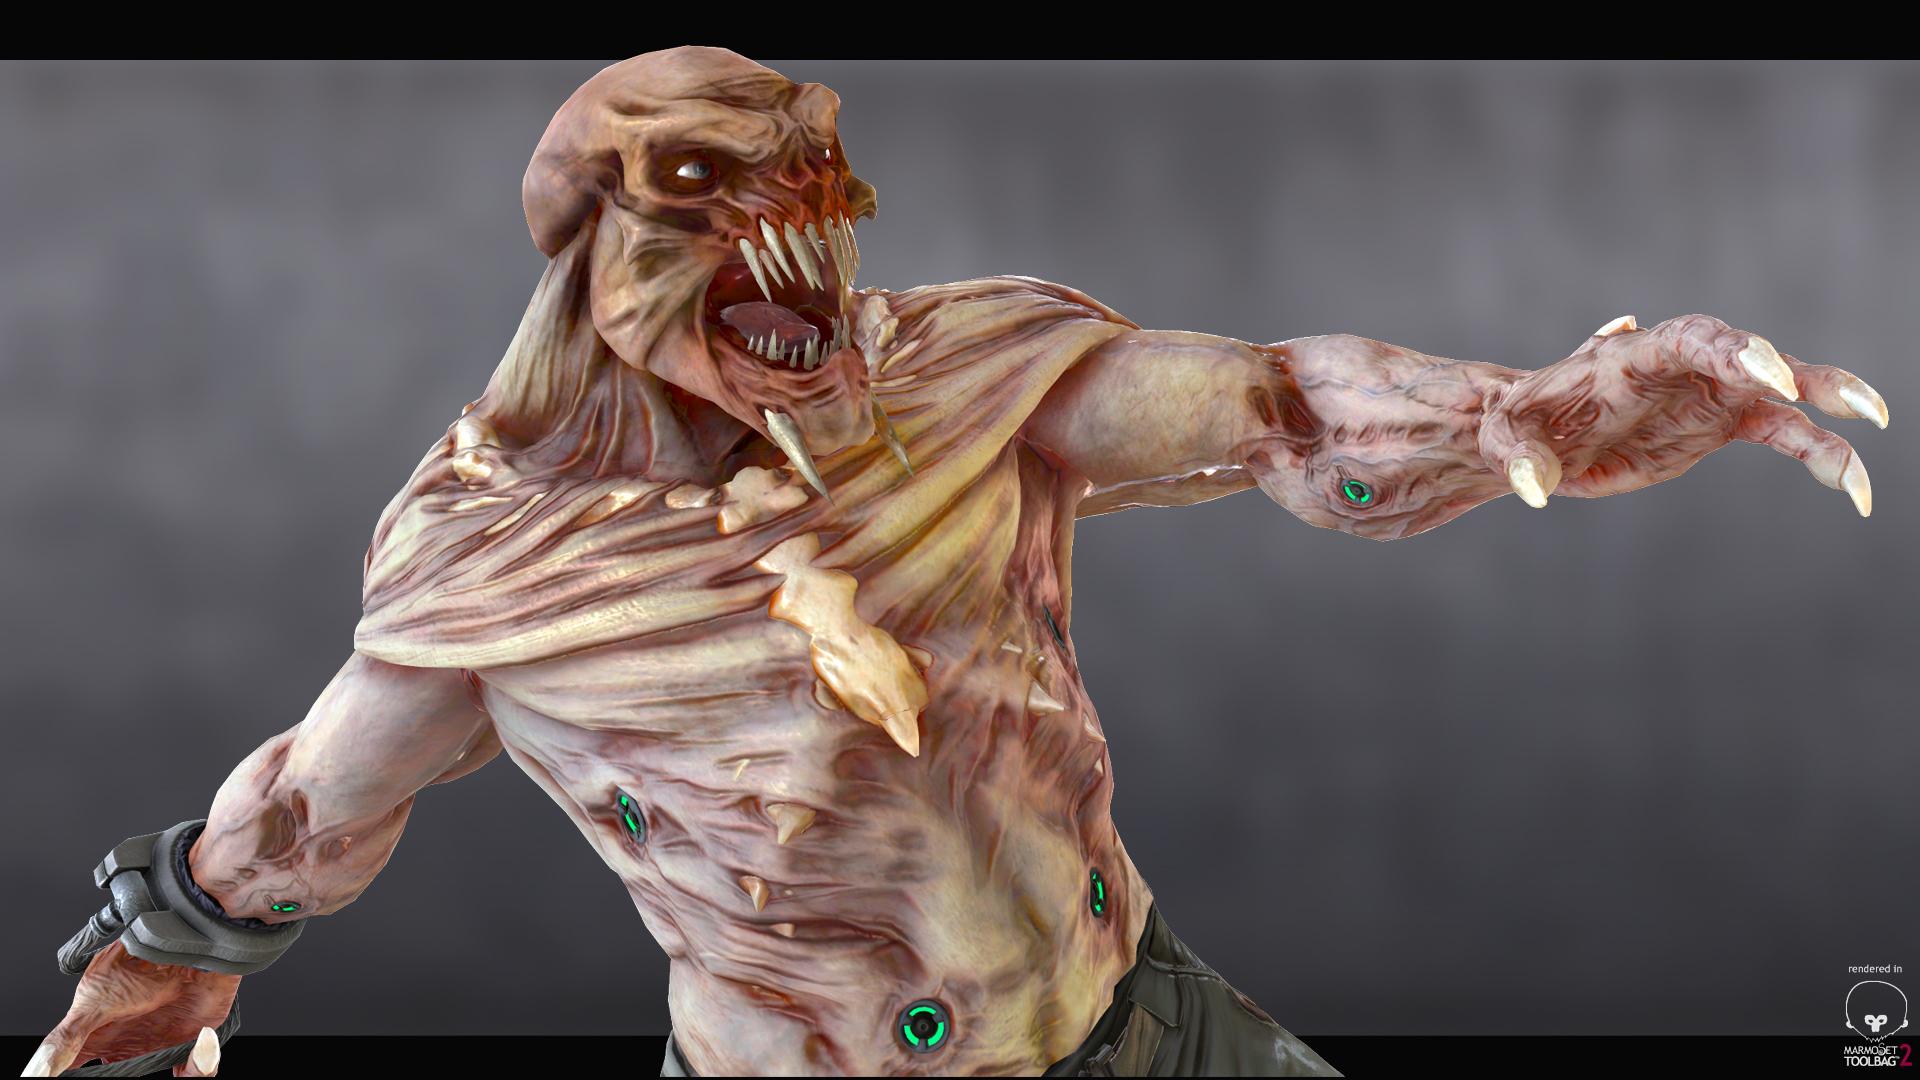 creature_character_by_michalhoz-d6x78sv.jpg